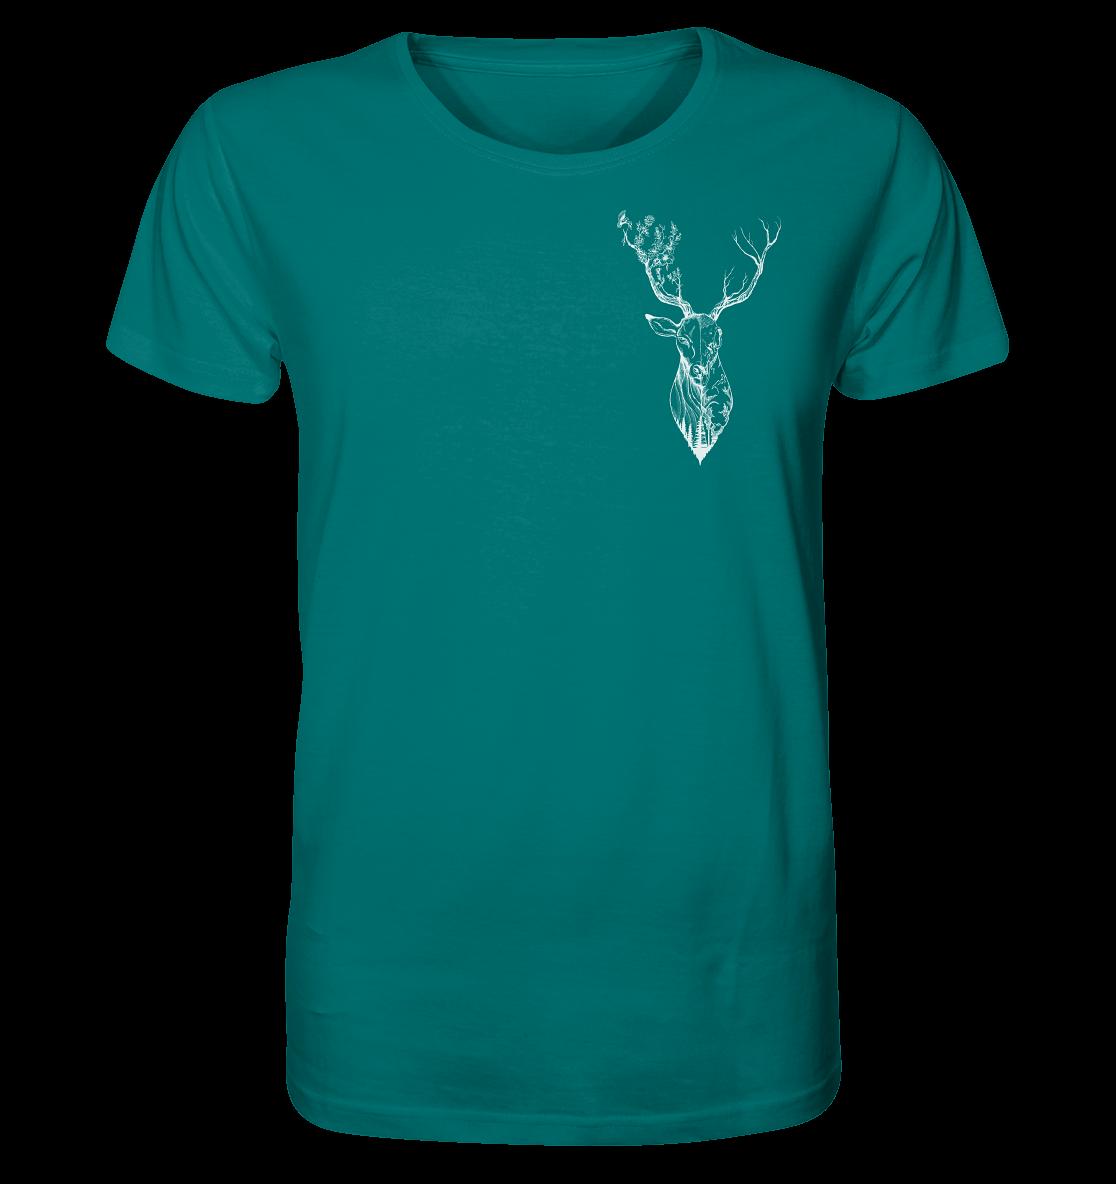 front-organic-shirt-007373-1116x-12.png